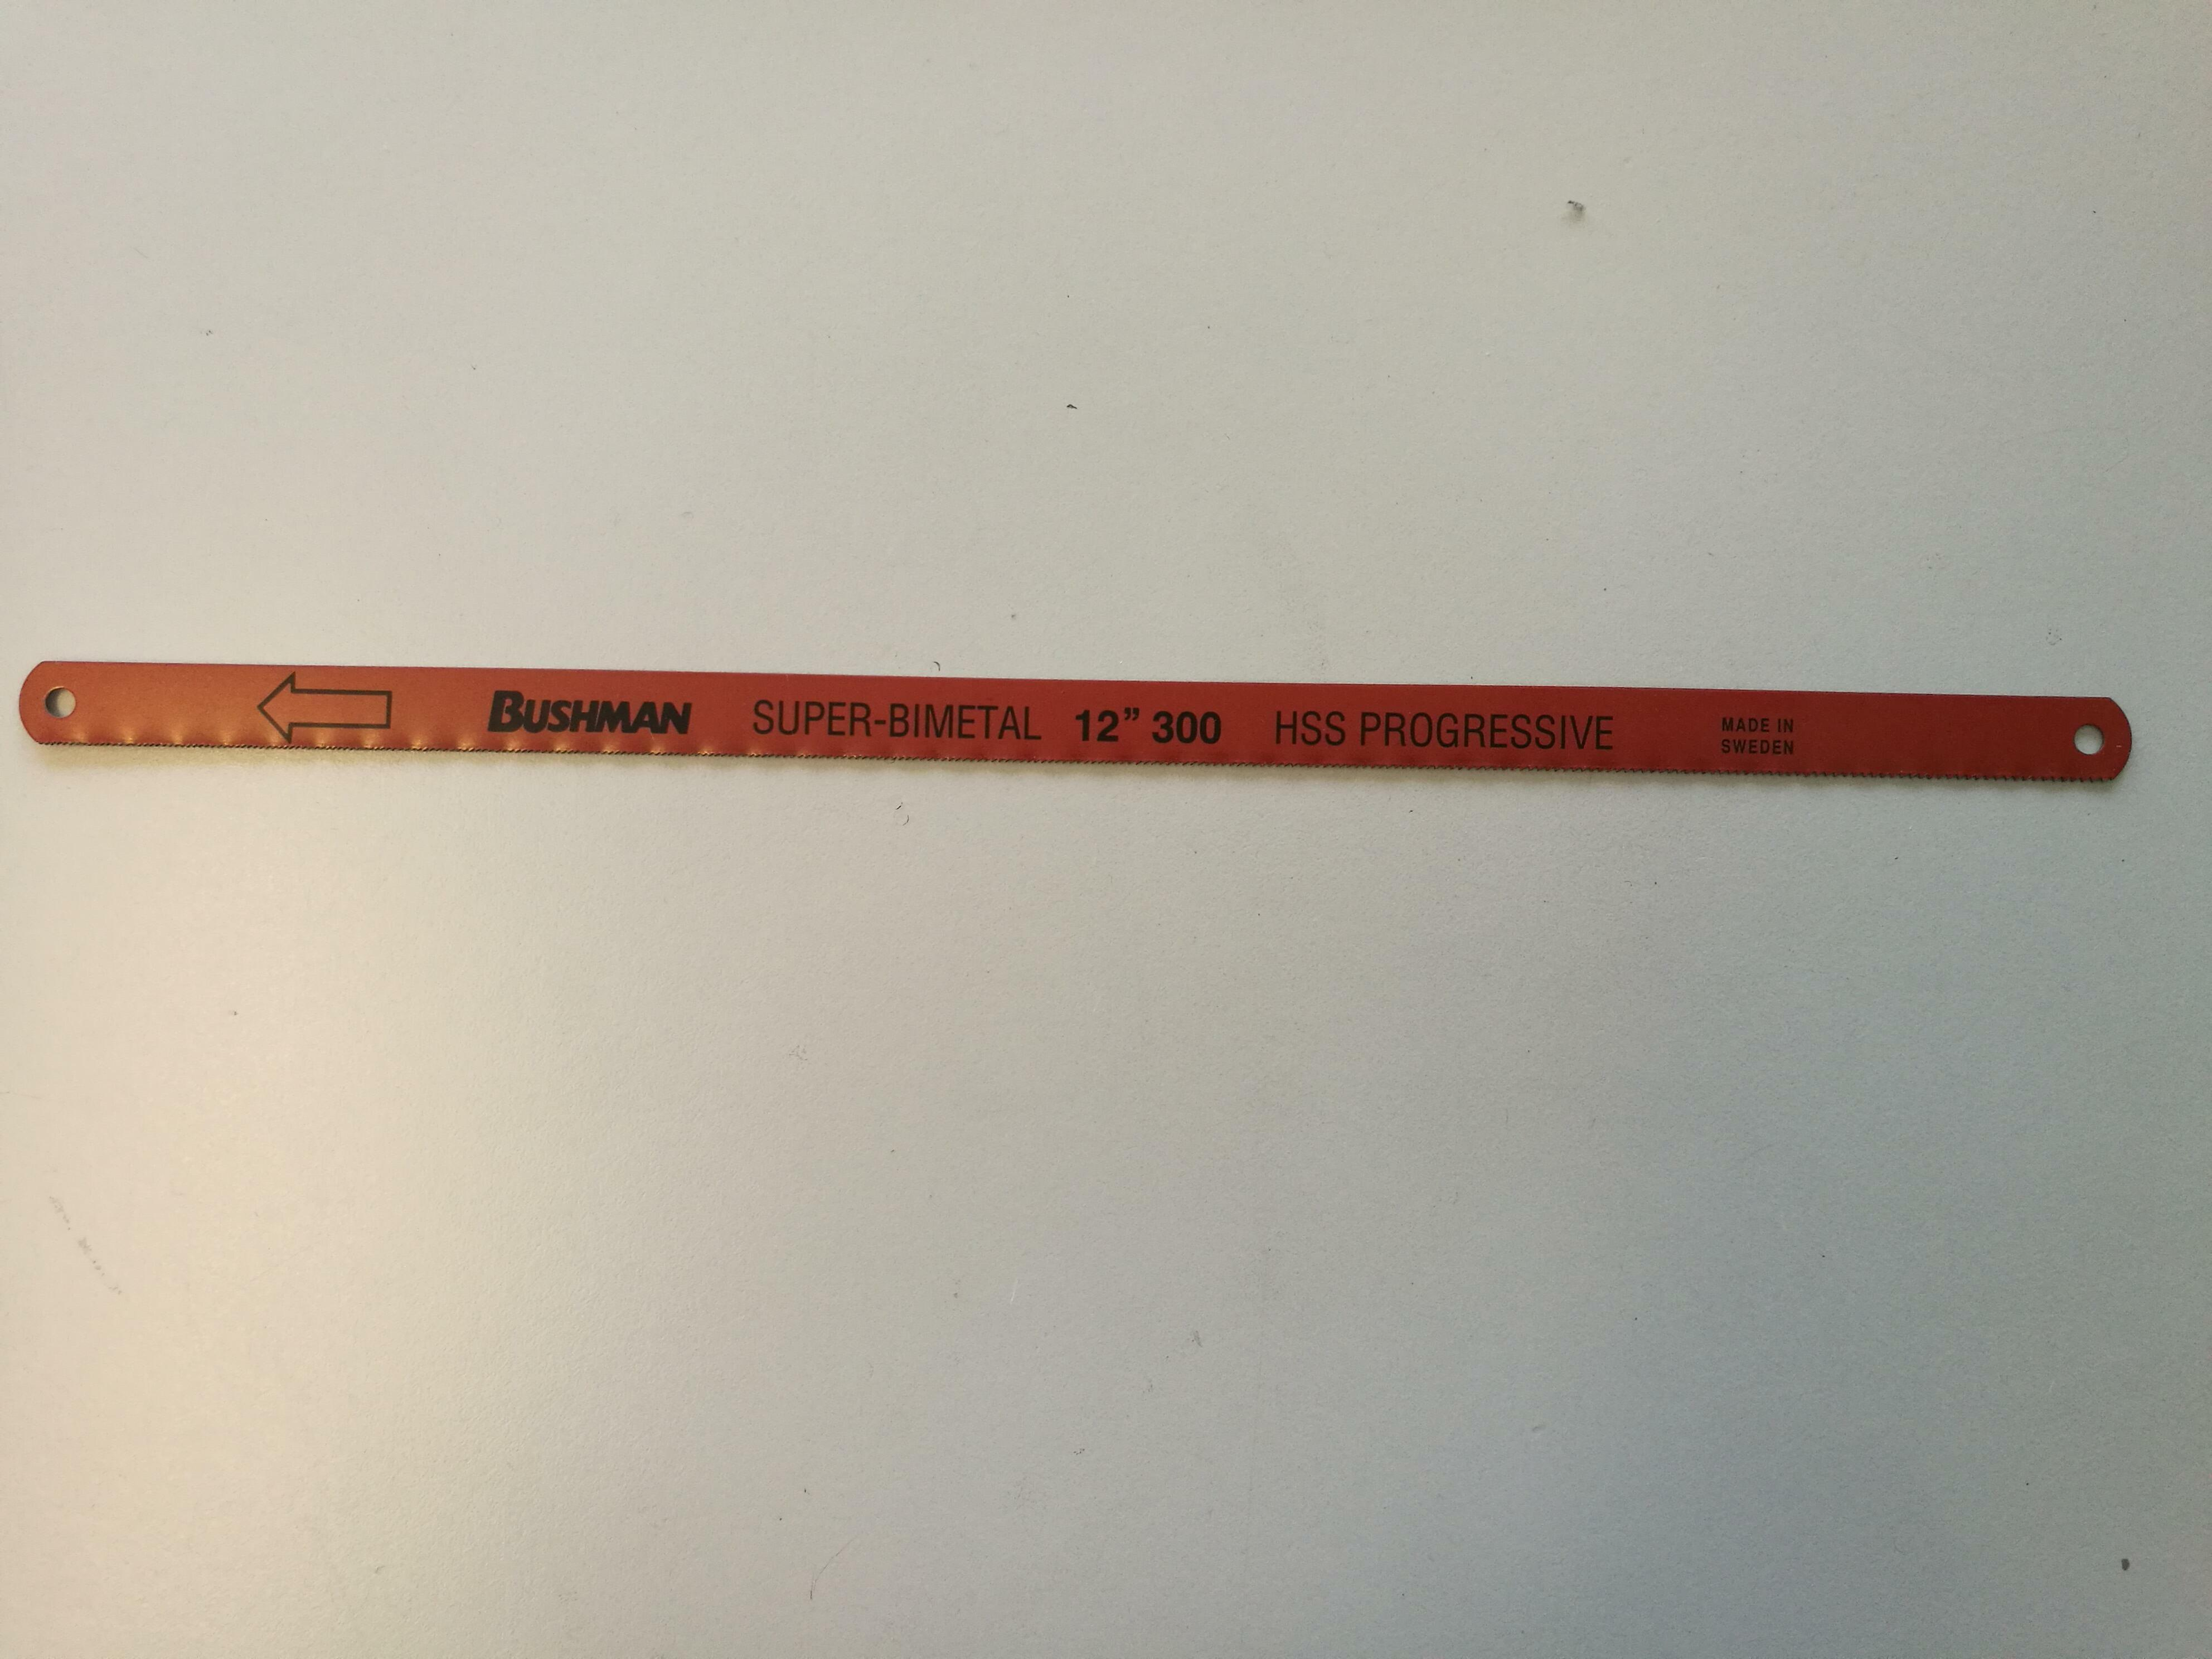 bushman bushman lame ferro super-bimetal 3806-300 hss progressive 30 cm